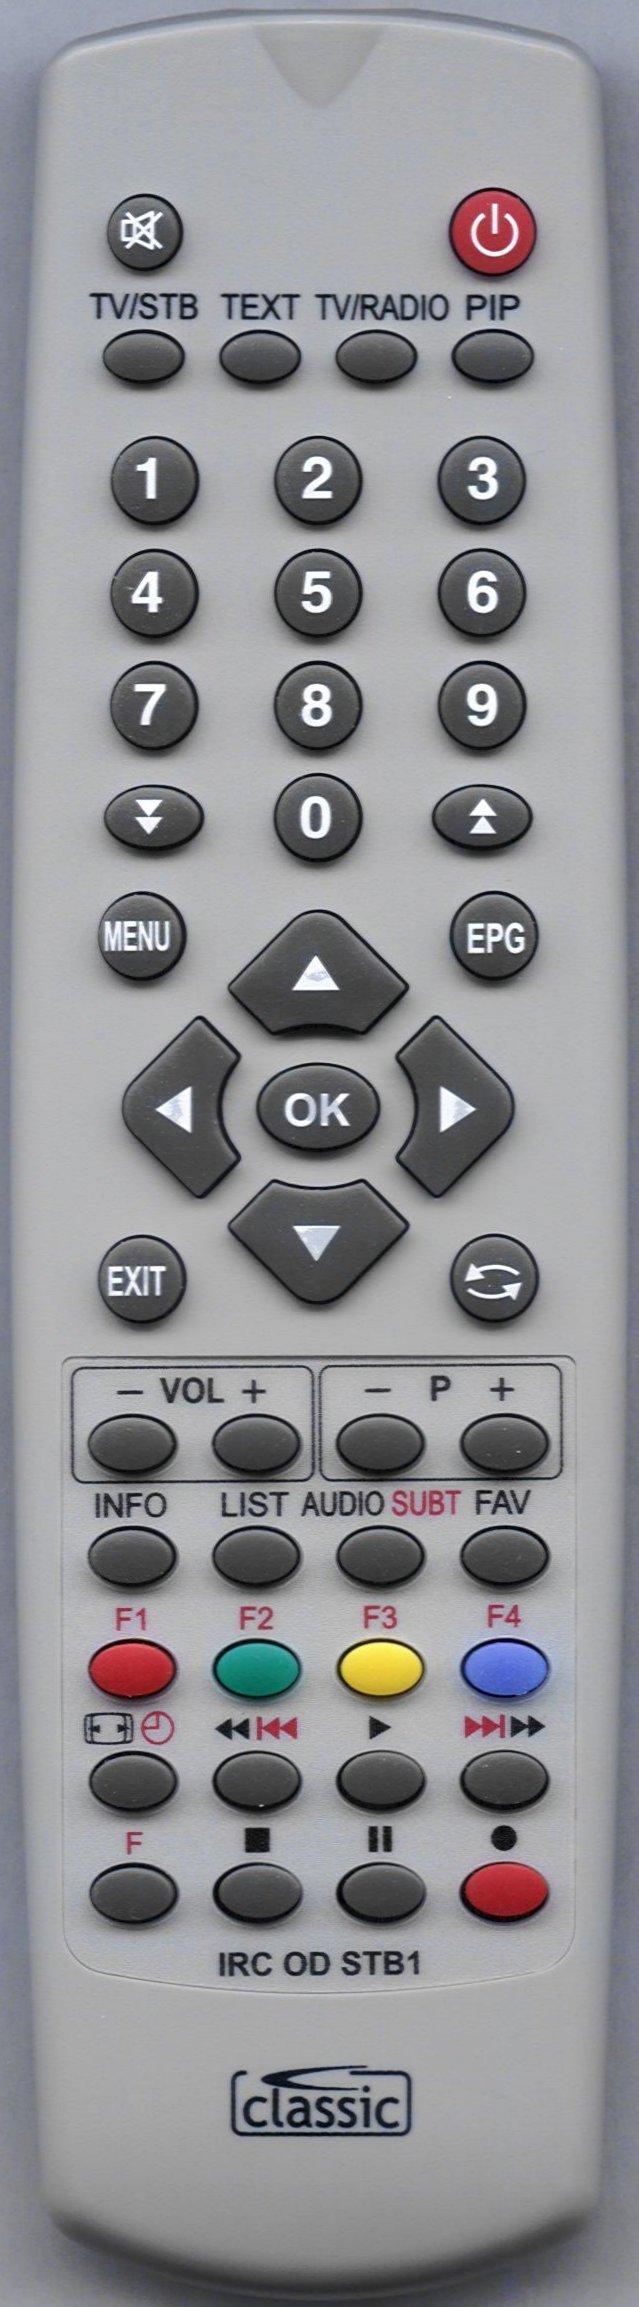 Topfield TF T5000HD PVR Remote Control